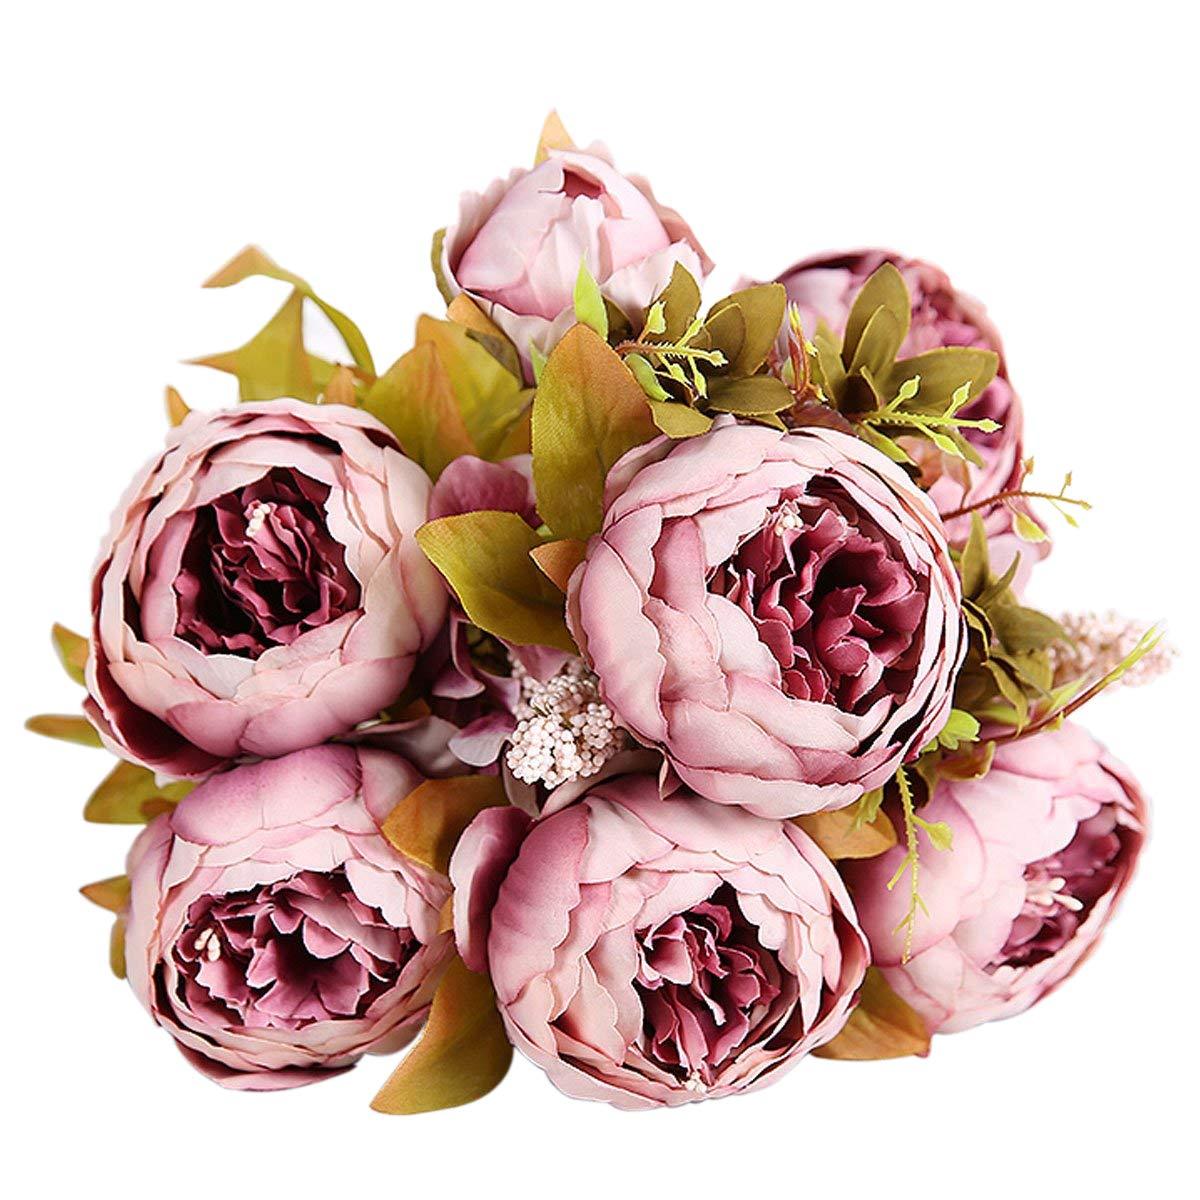 Amazon.com: Bringsine Vintage Artificial Peony Silk Flowers Bridal ...